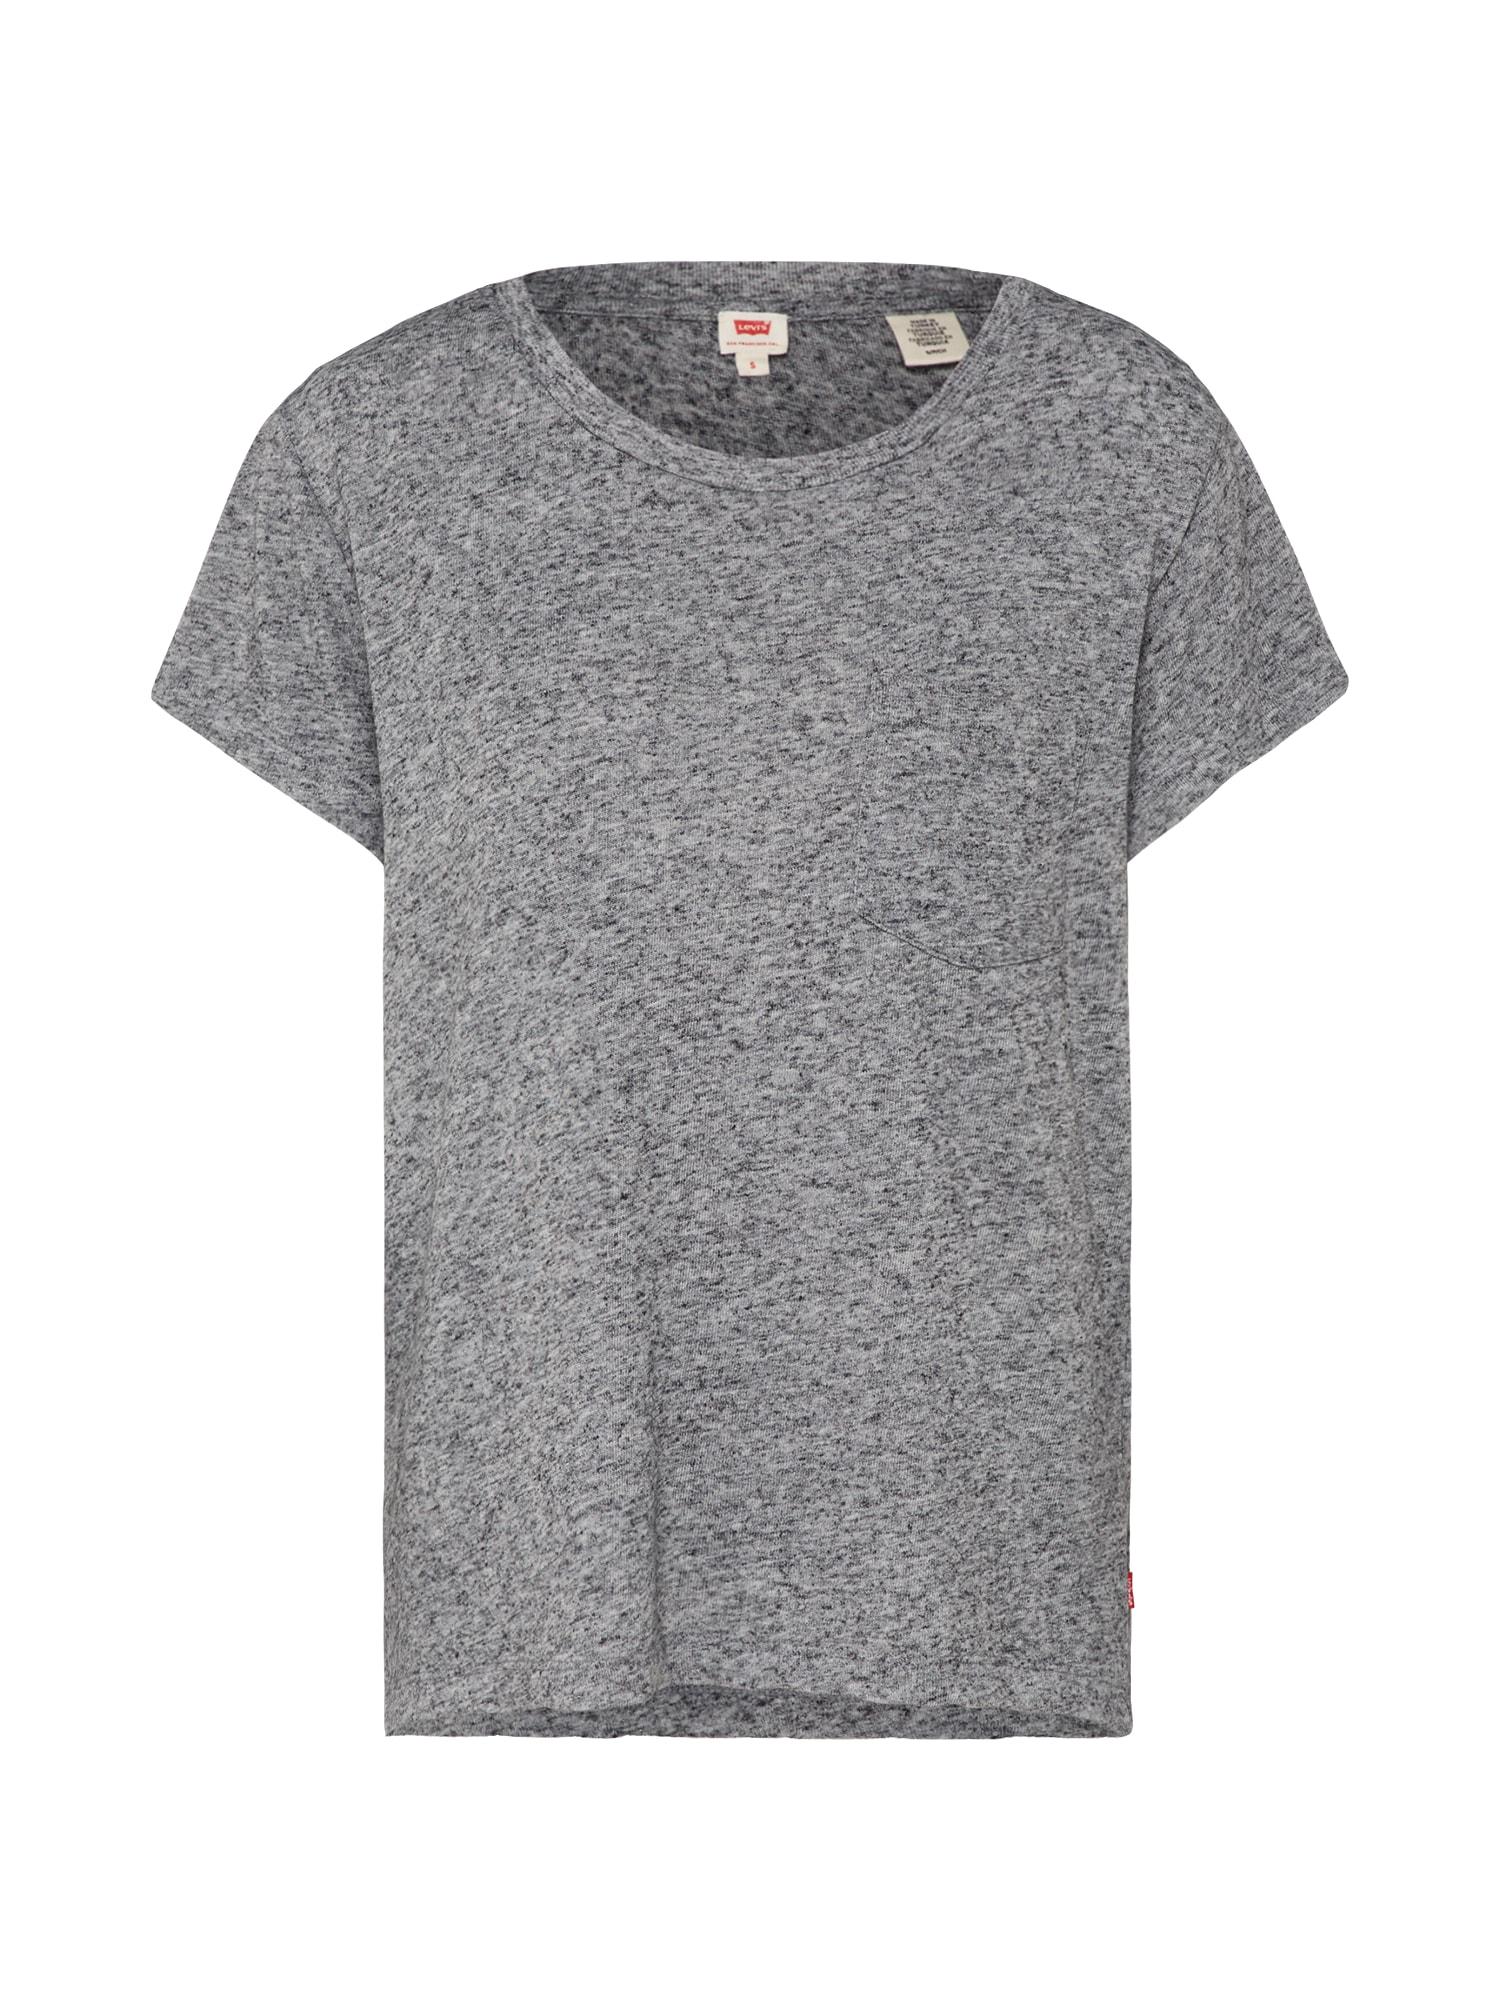 LEVI'S Dames Shirt The perfect pocket tee grijs gemêleerd